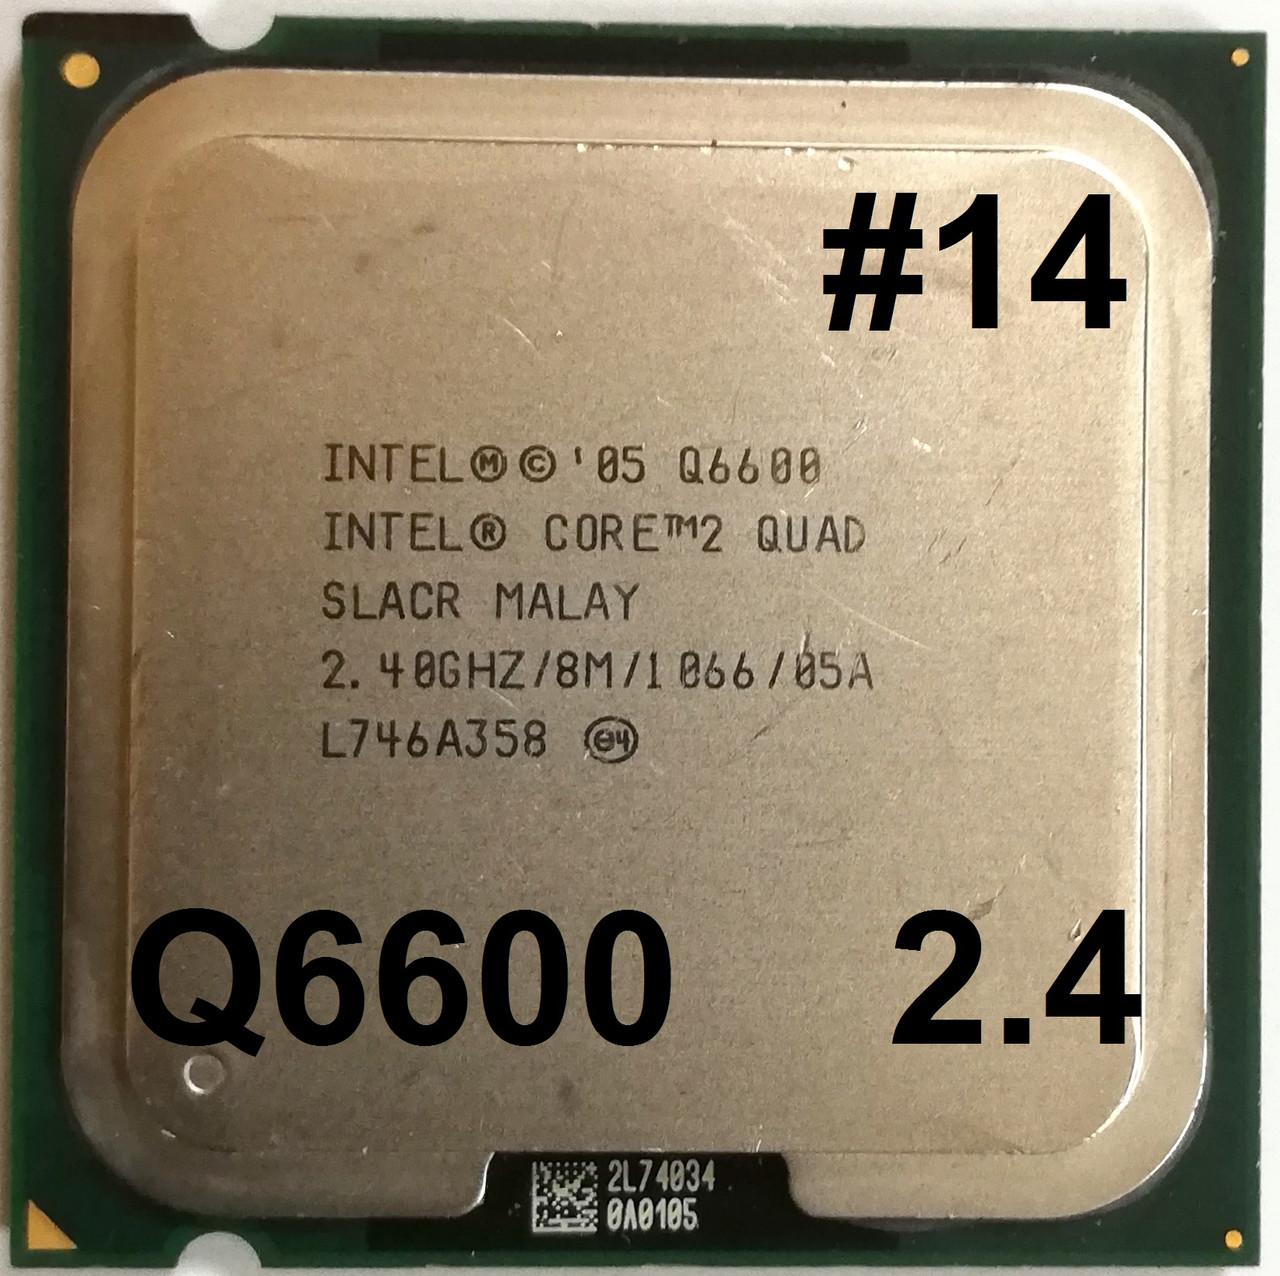 Процессор ЛОТ#14 Intel Core 2 Quad Q6600 SLACR 2.4GHz 8M Cache 1066 MHz FSB Socket 775 Б/У